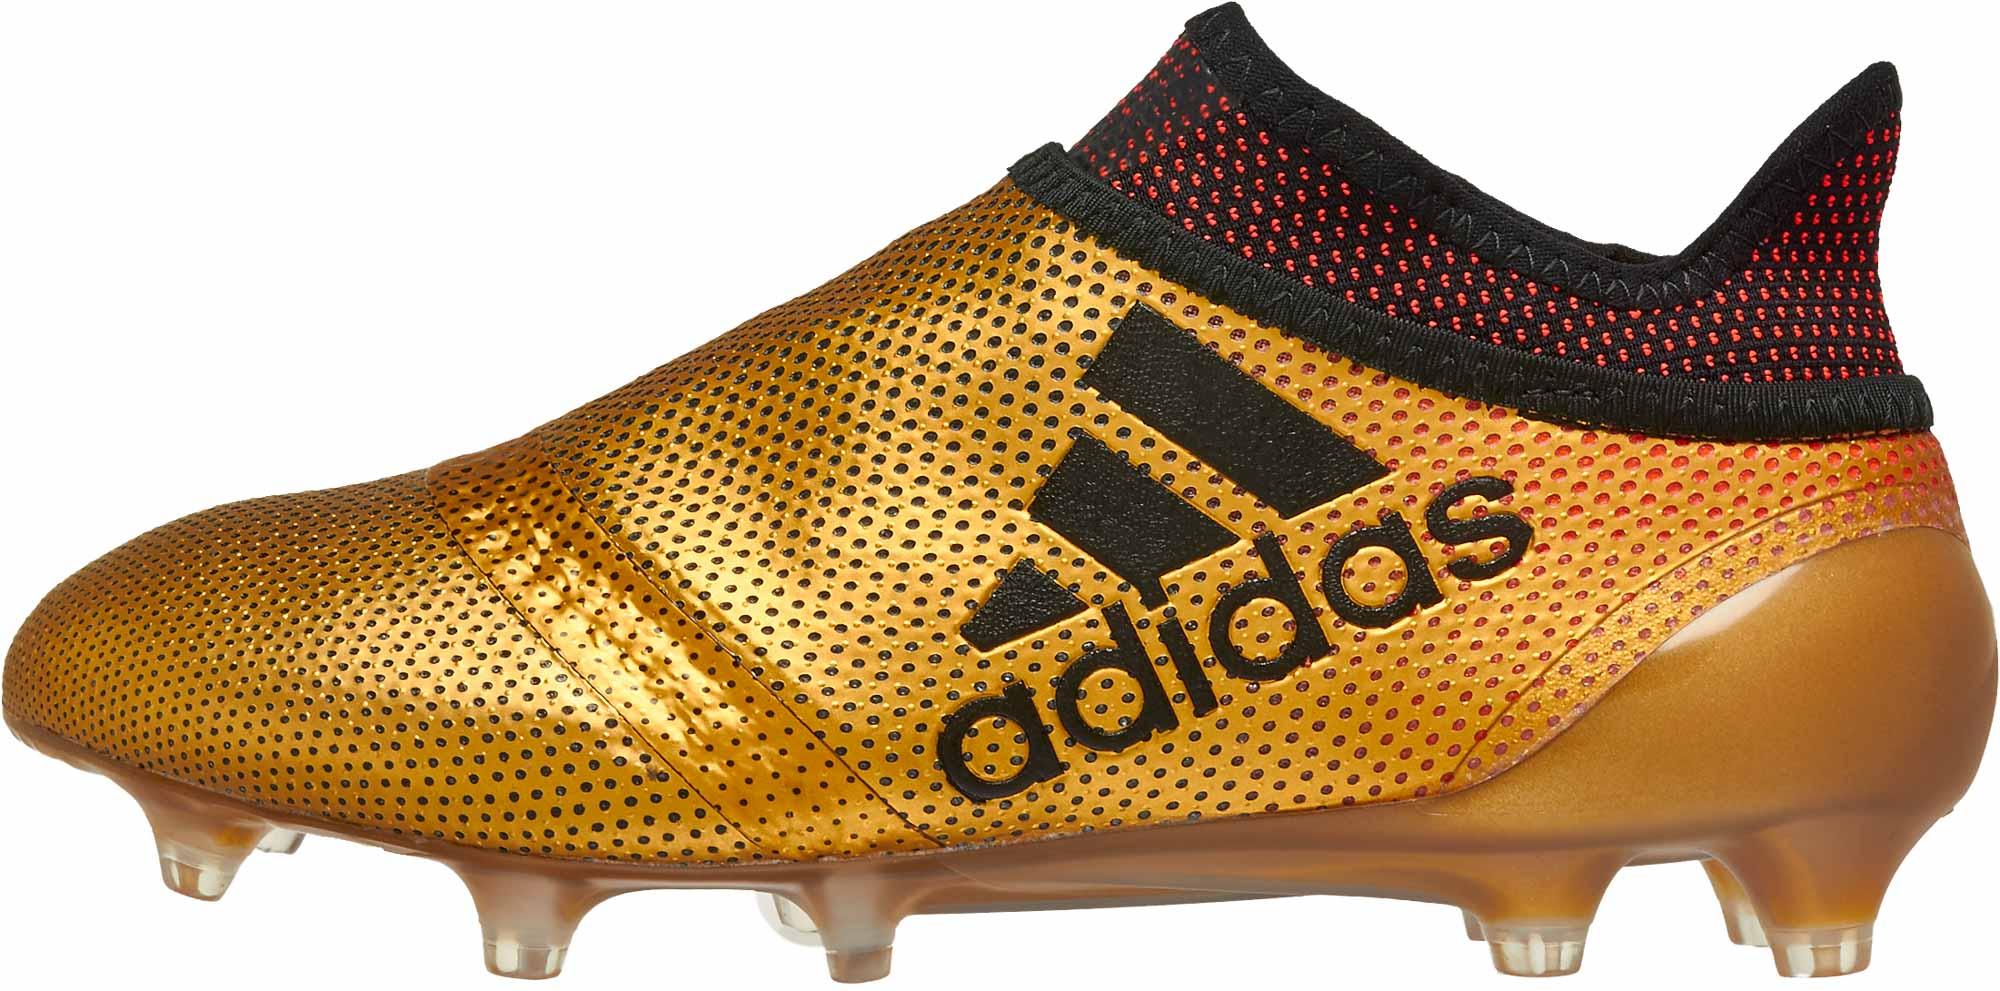 3515d1763fe9 adidas Kids X 17 FG – Tactile Gold Metallic/Solar Red